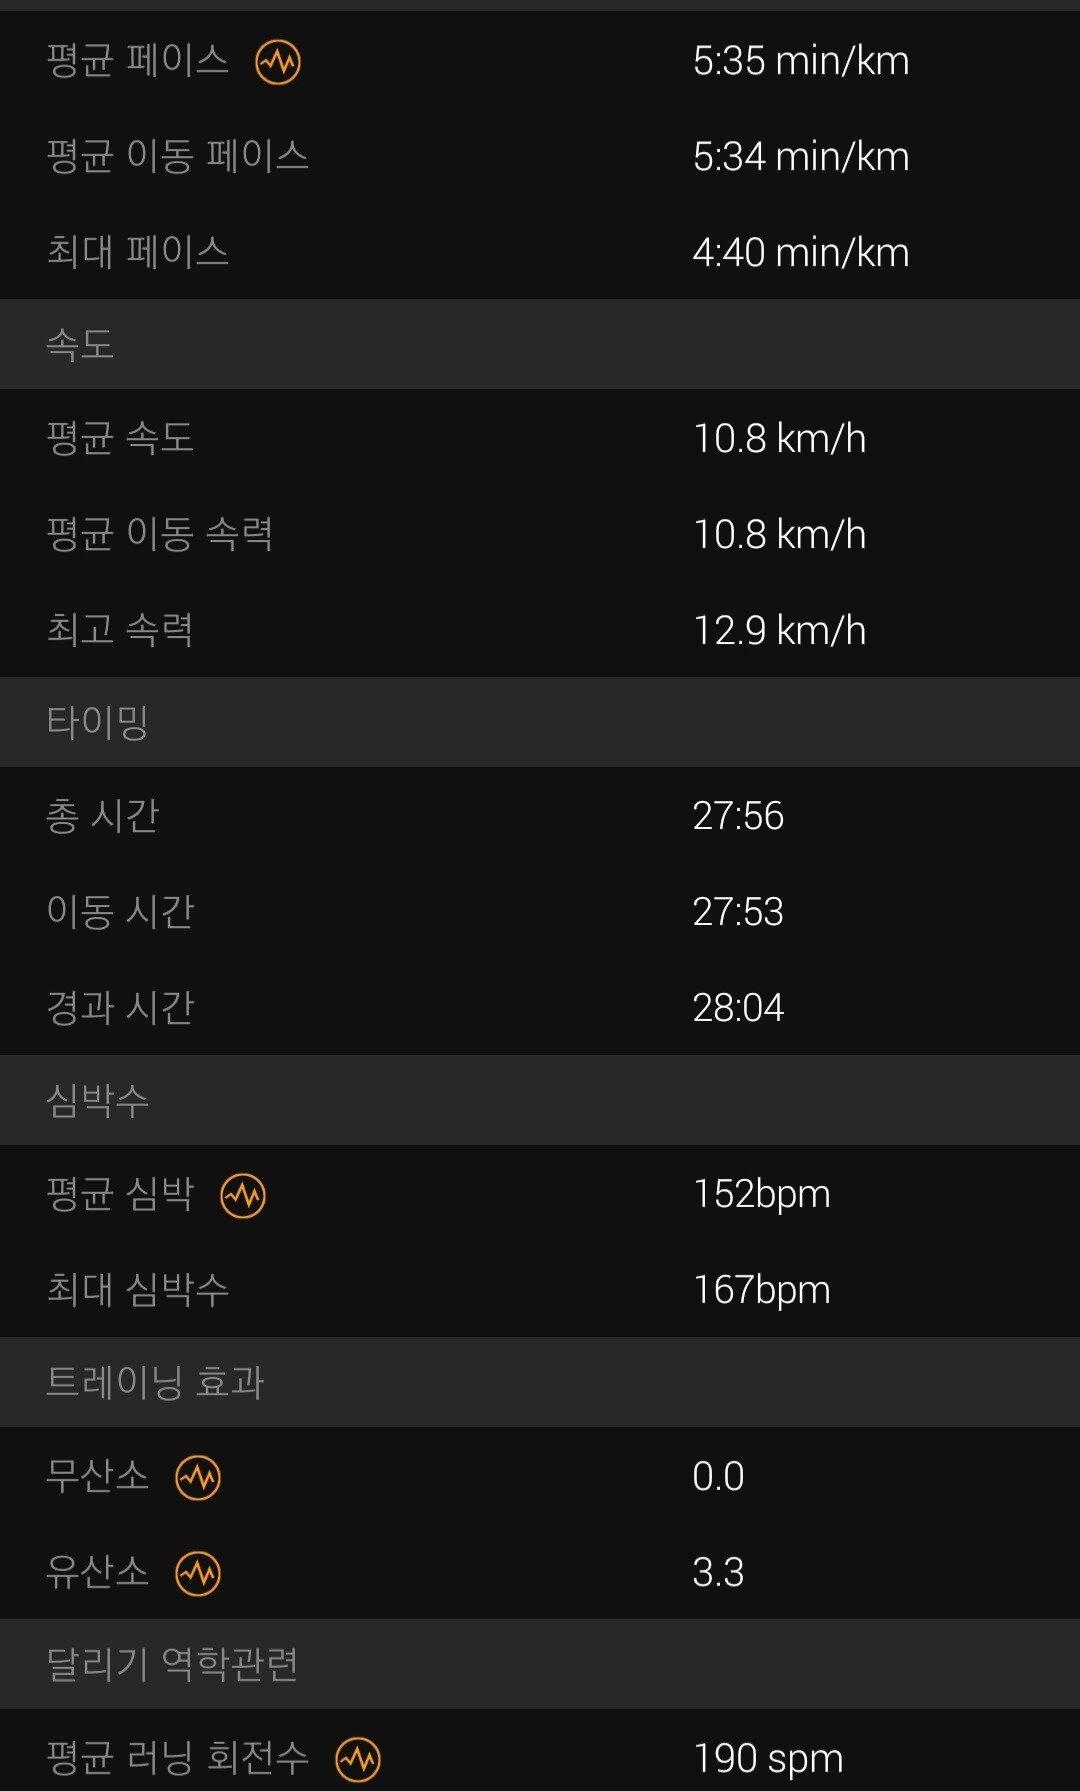 Screenshot_20210507-184227_Connect.jpg 소고기 먹기전에 유산소 빡세게 ^^ 존맛탱 다이어트 저녁.JPG